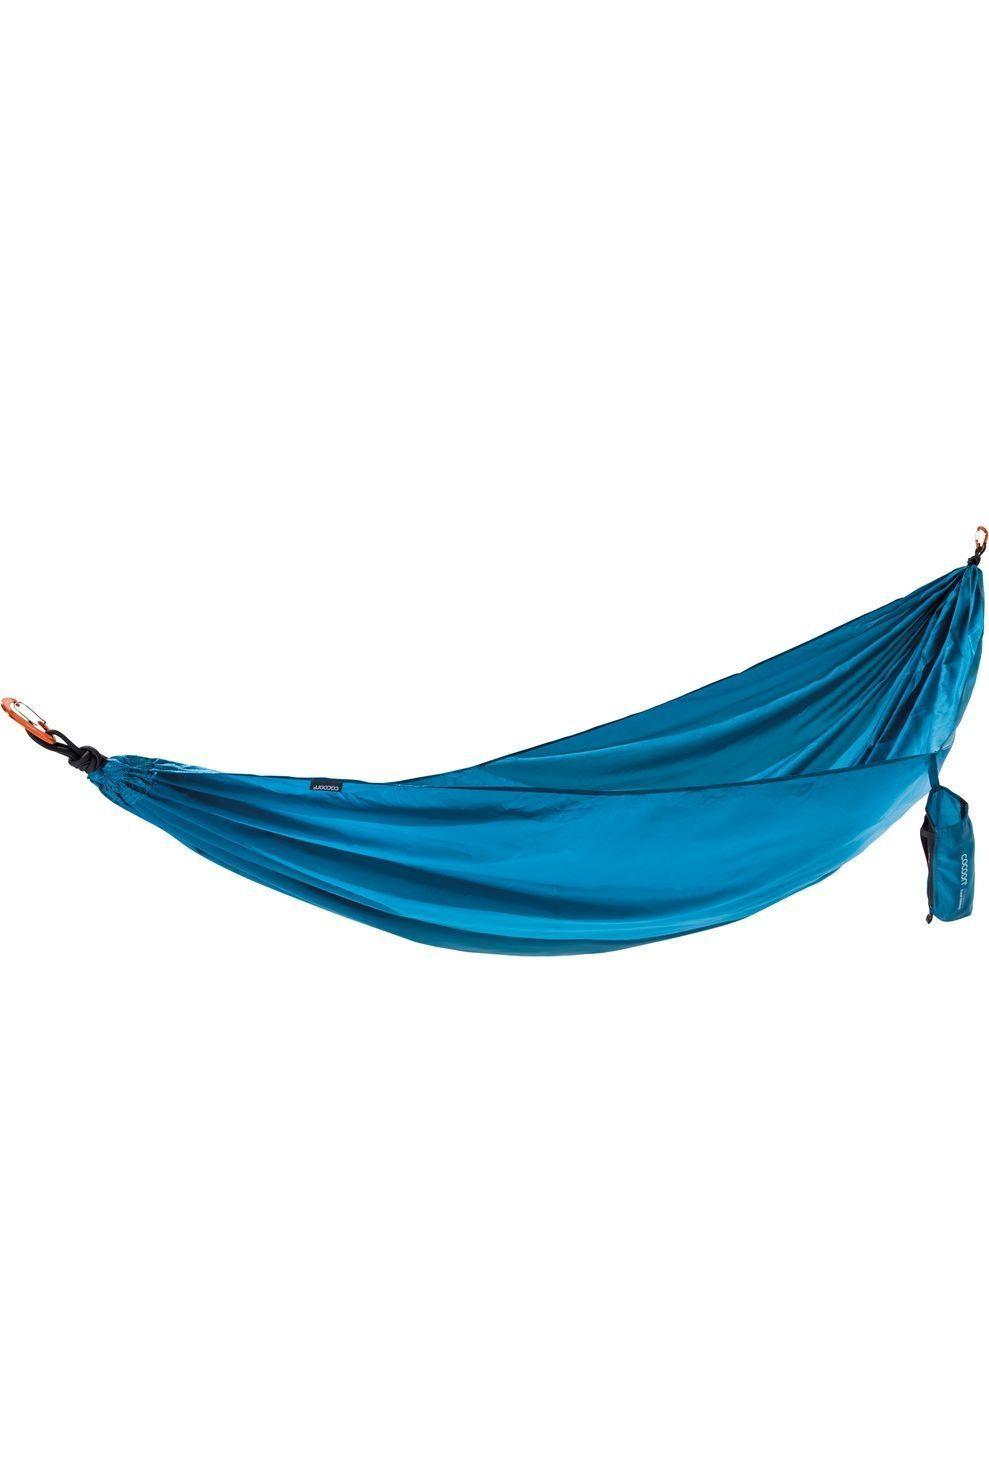 Cocoon Hangmat Compact Travel Hammock - Blauw